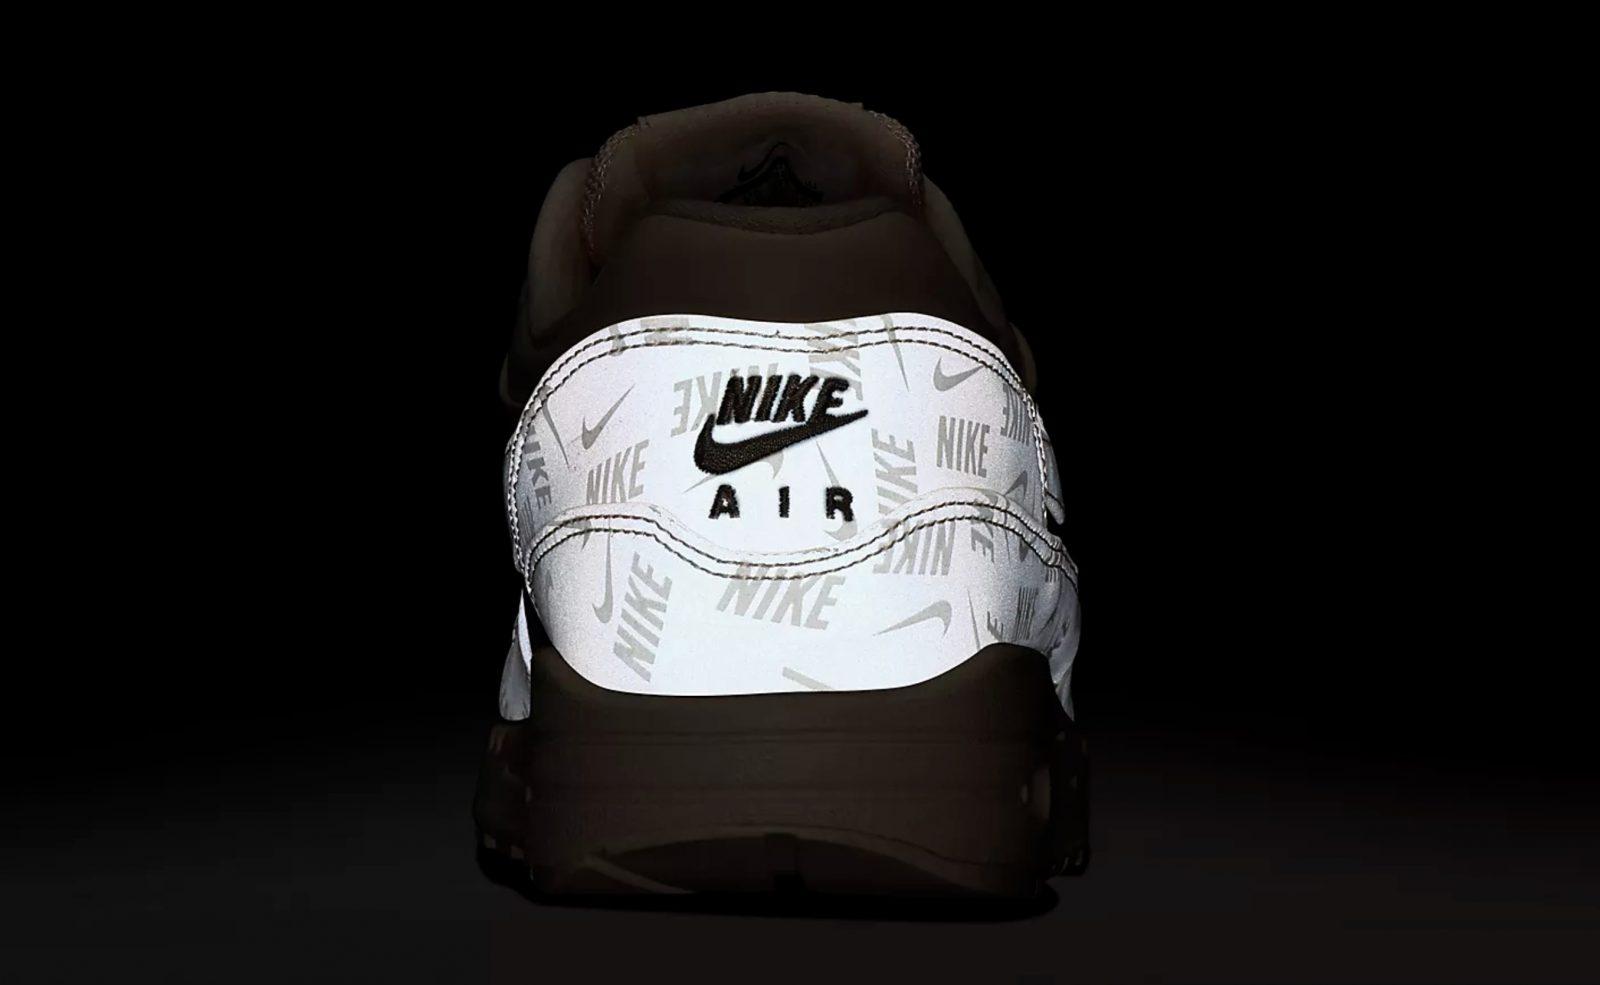 Nike Air Max 1 LX Guava Glow in the Dark | 917691-801